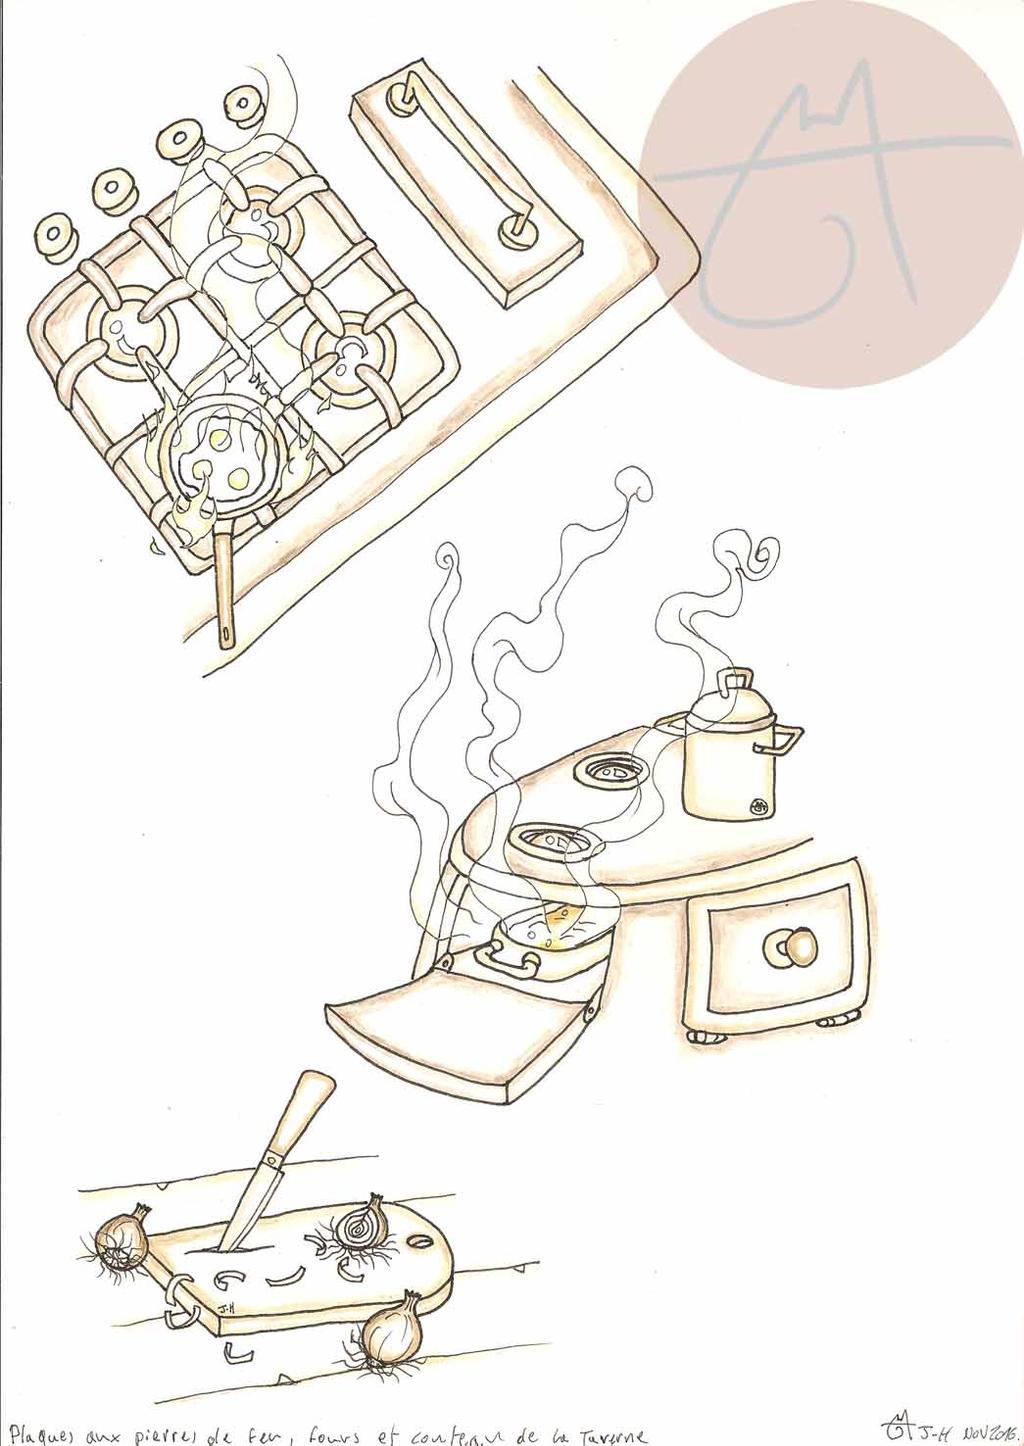 materiels de cuisine et ustensiles de la taverne by raanana on deviantart. Black Bedroom Furniture Sets. Home Design Ideas